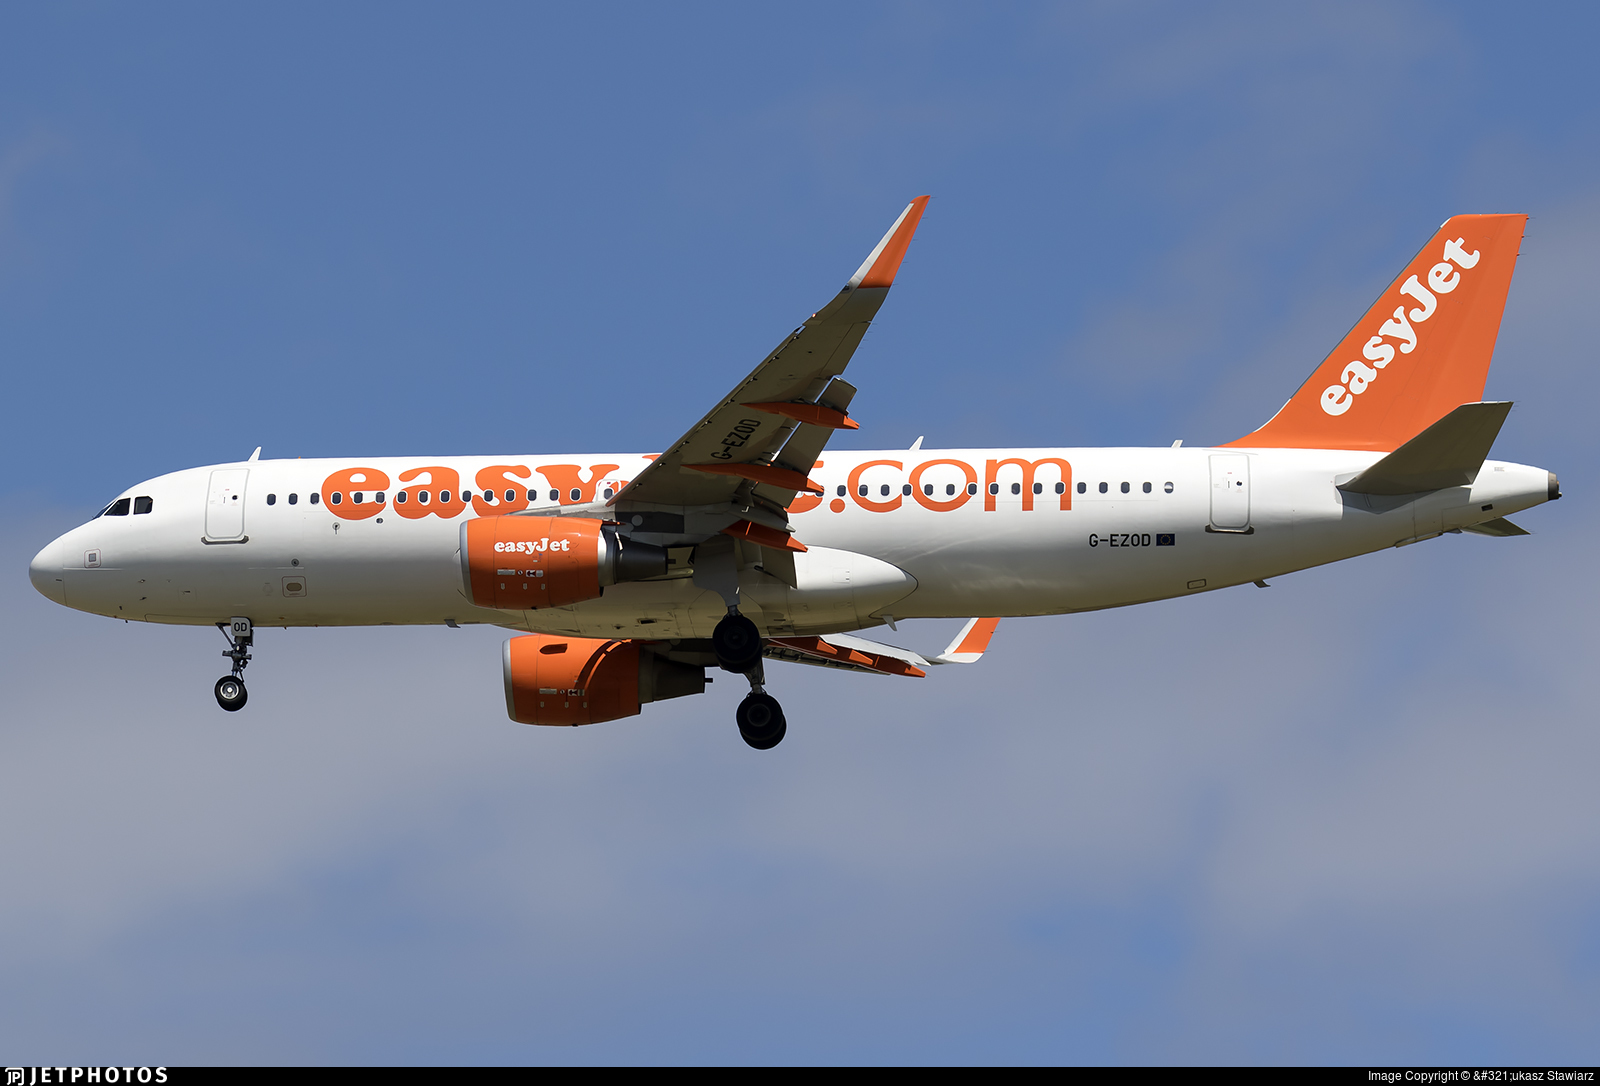 G-EZOD - Airbus A320-214 - easyJet